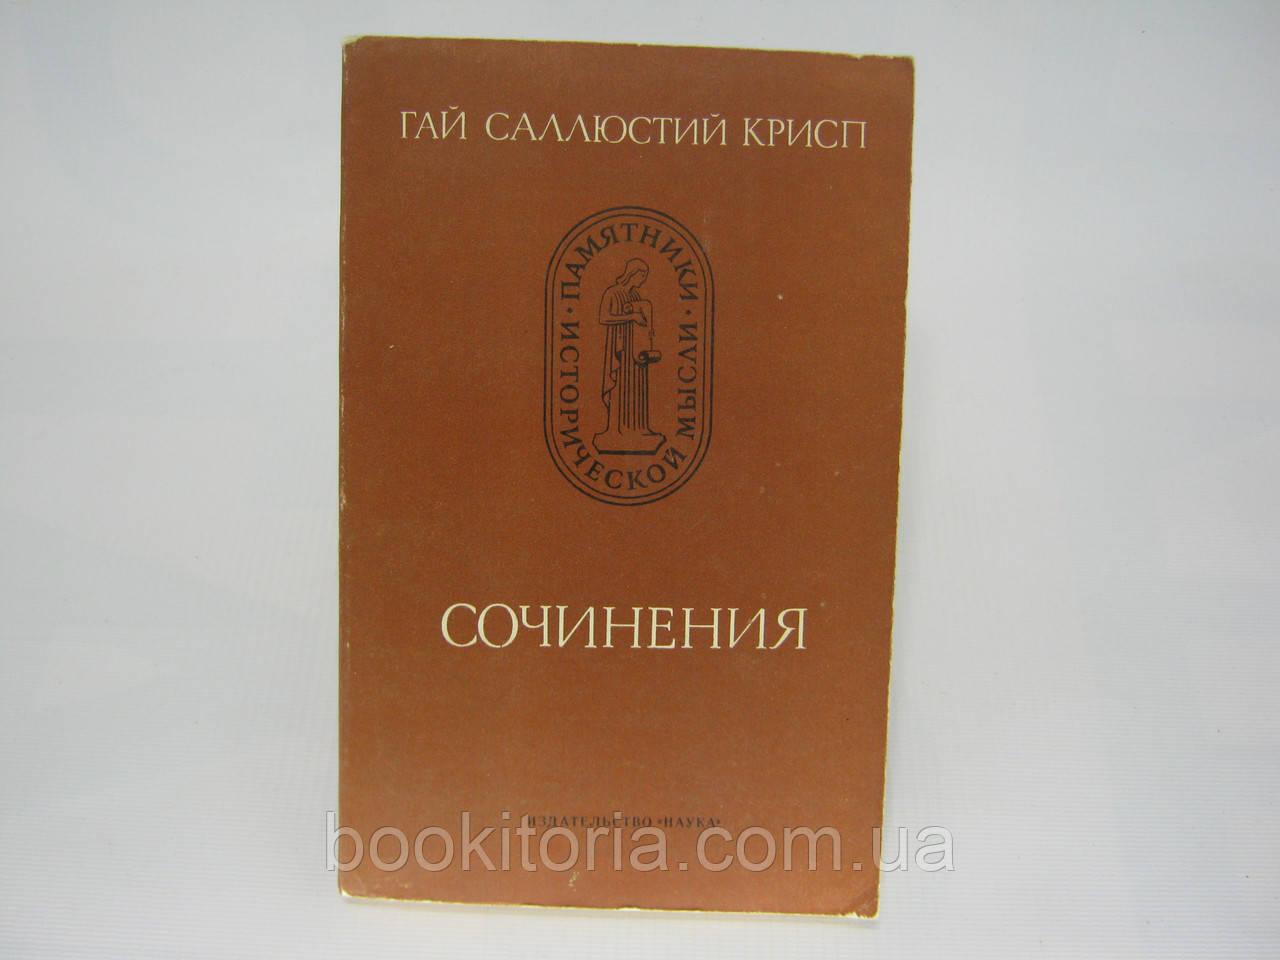 Гай Саллюстий Крисп. Сочинения (б/у).